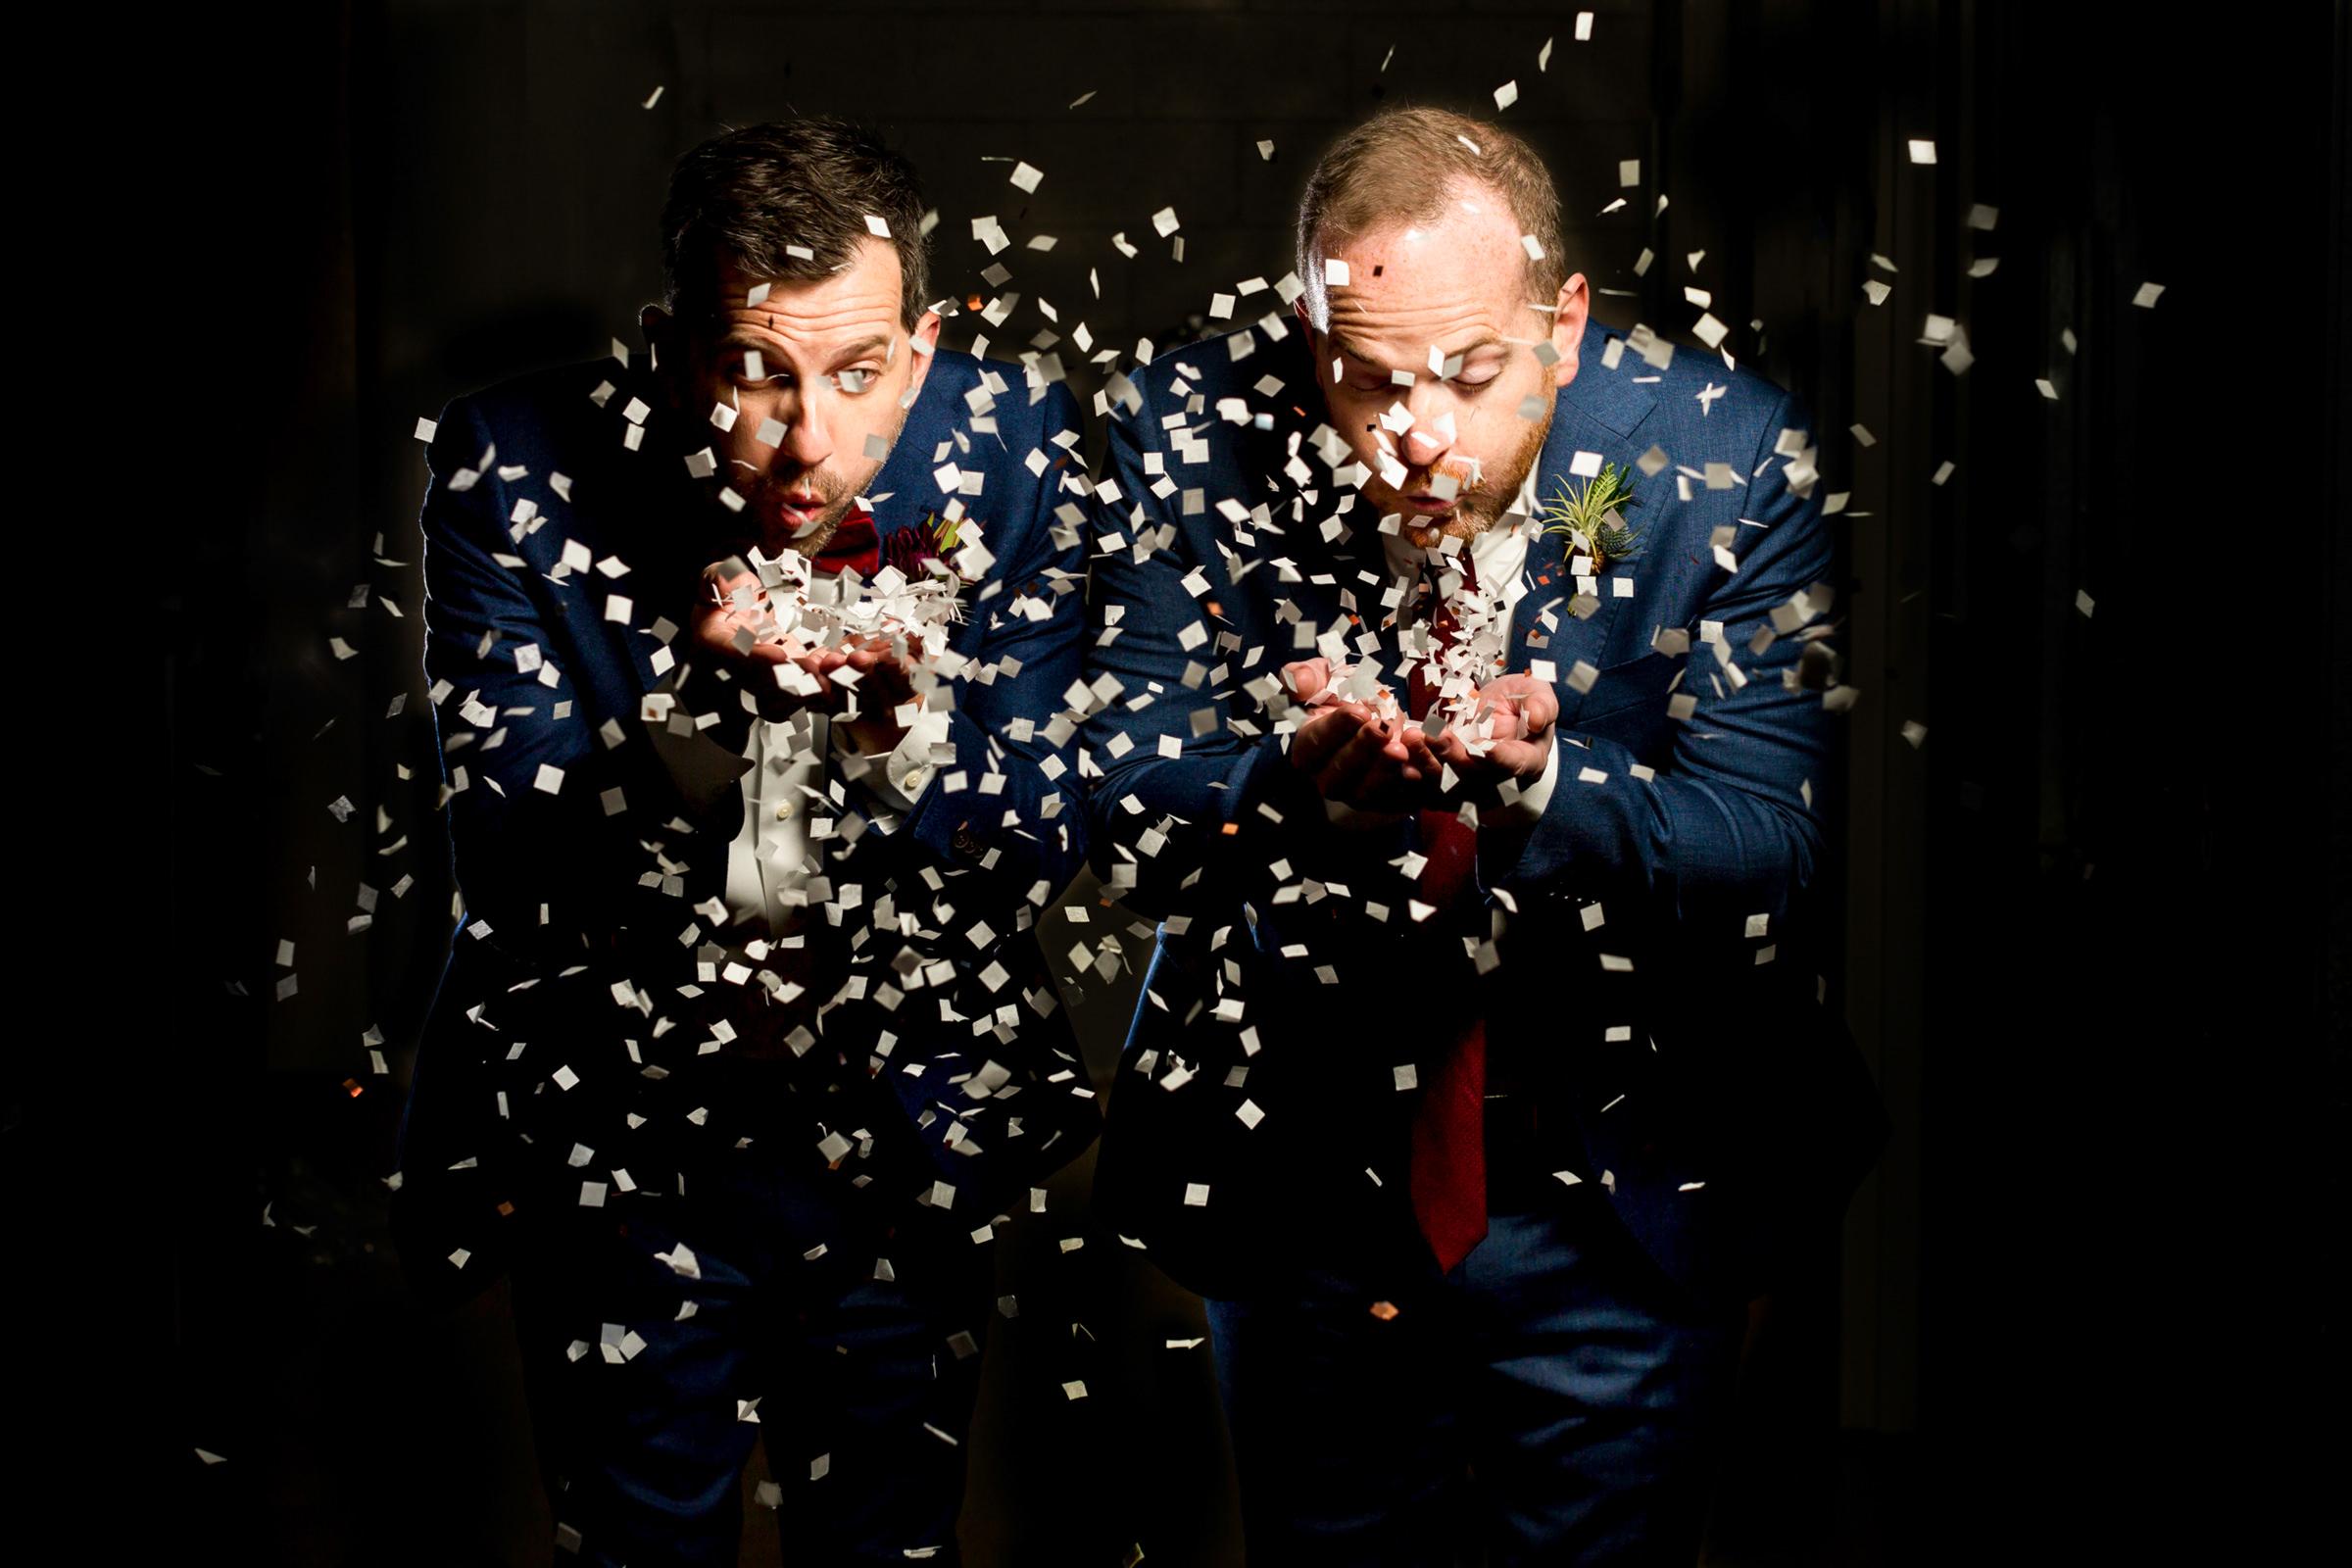 Groomsmen dispersing confetti - photo by Procopio Photography